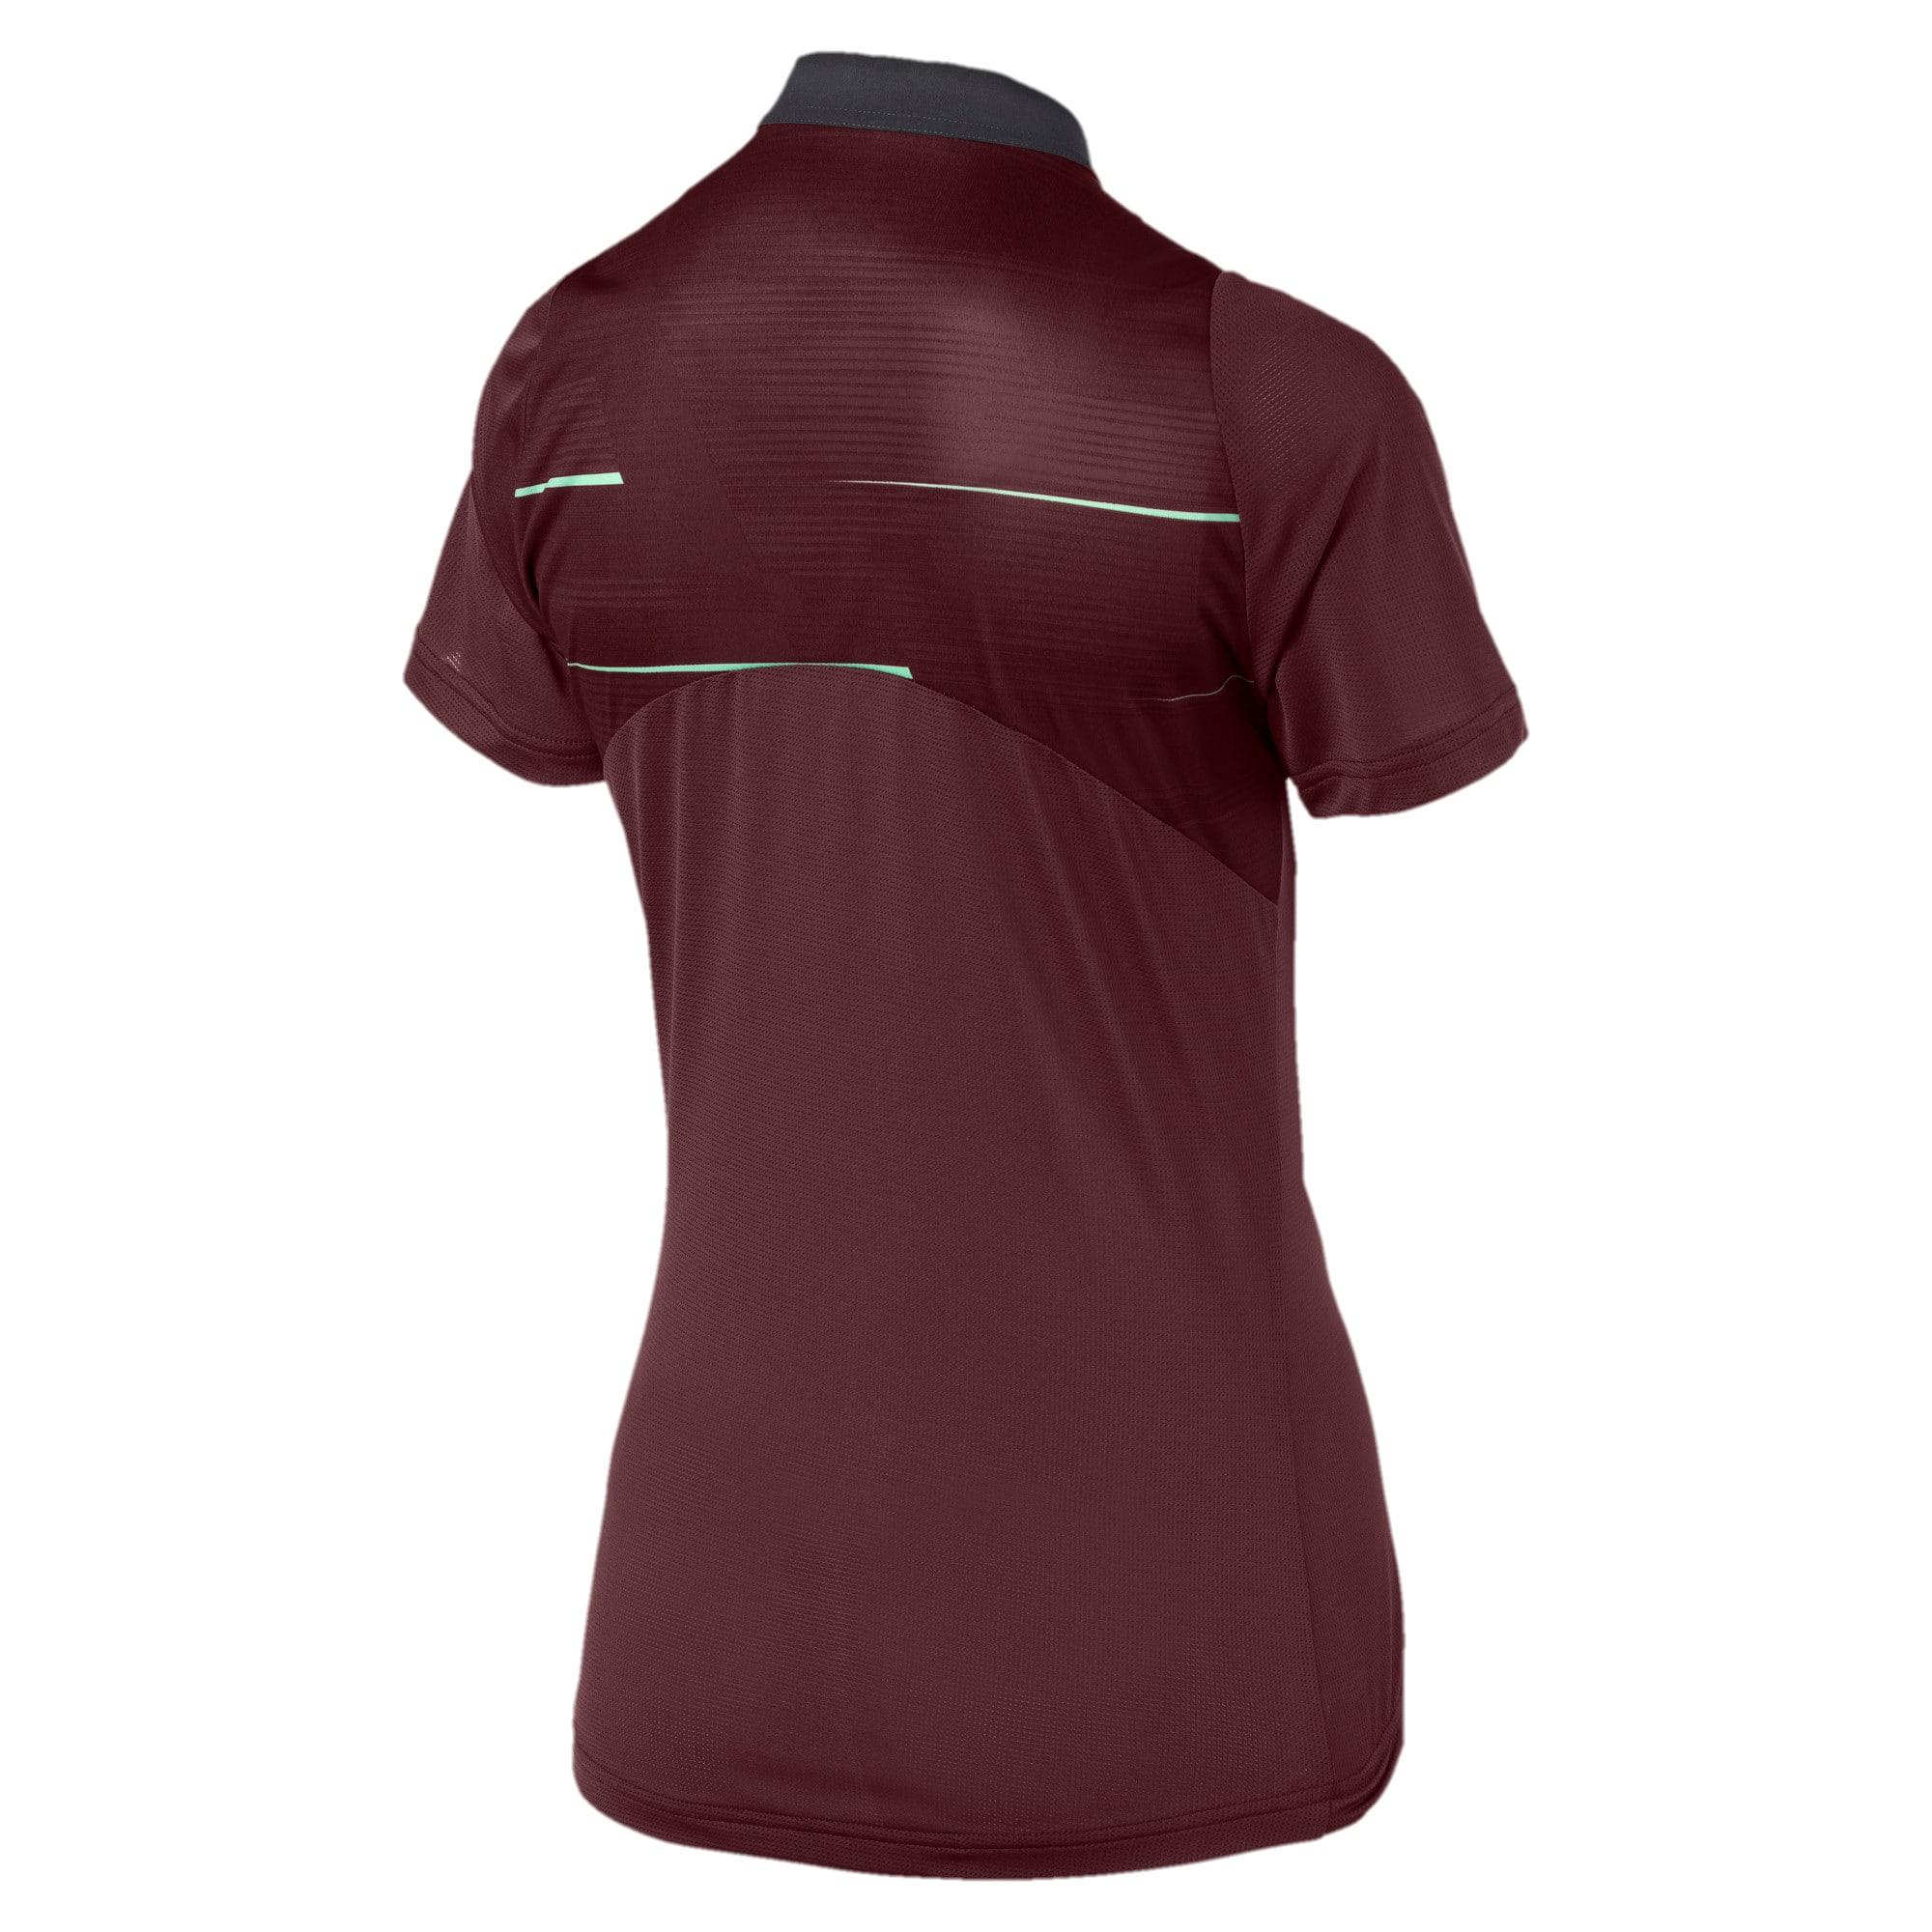 Thumbnail 5 of ftblNXT Graphic Women's Football Shirt, Vineyard Wine-Green Glimmer, medium